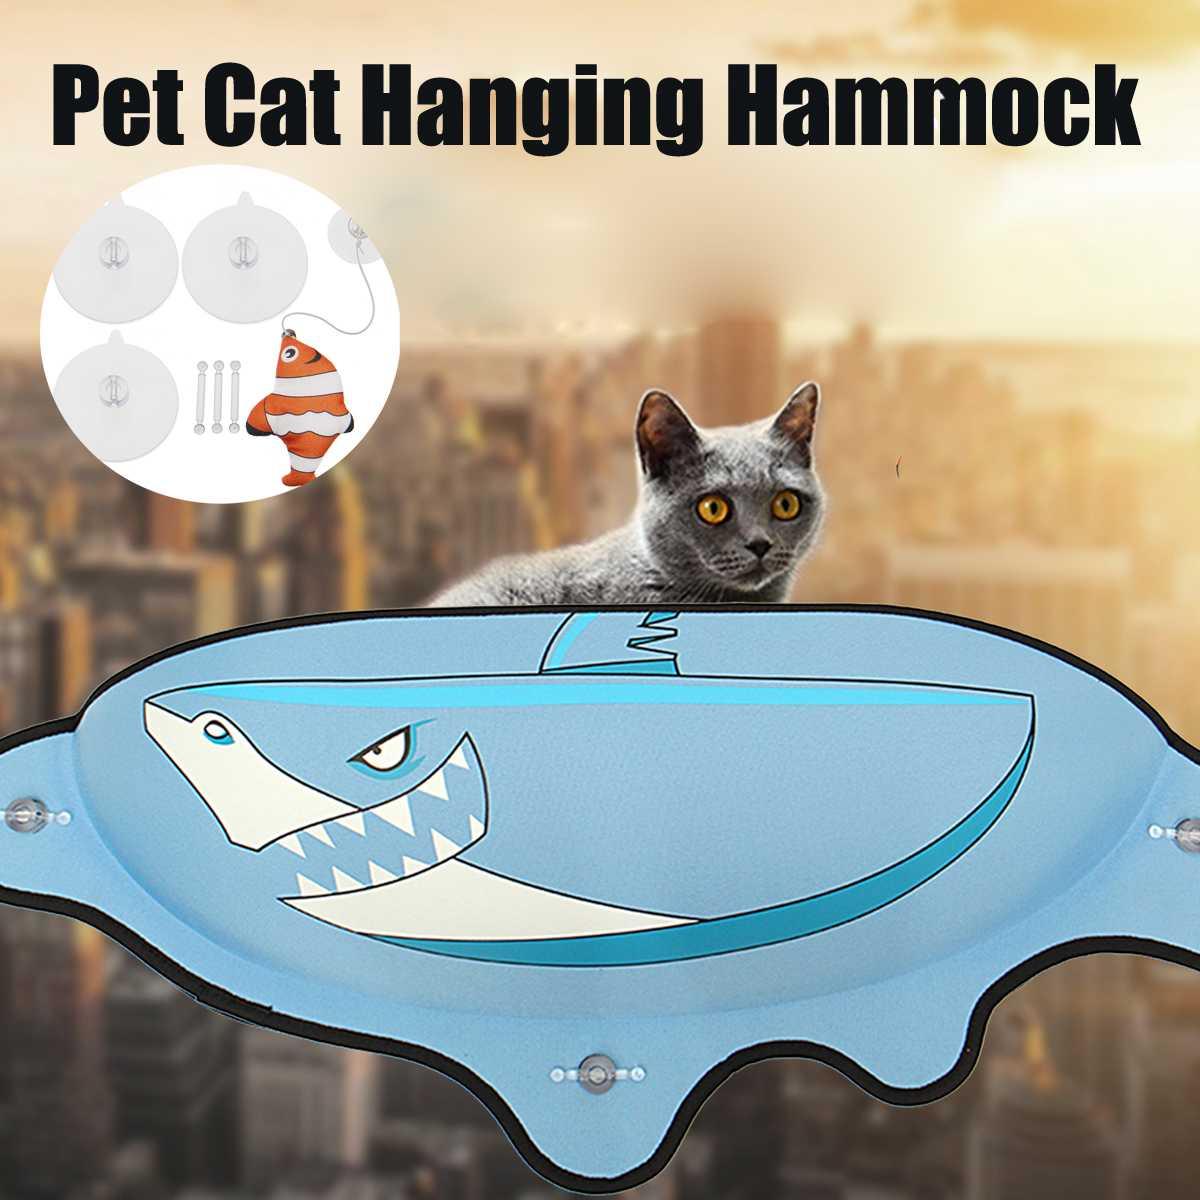 Cat Beds & Mats Temperate Hanging Cat Bed Mat Soft Cat Hammock Window Hammocks Kennels 10kg Cat Safe Hanging Shelf Seat Beds Cover Cushion